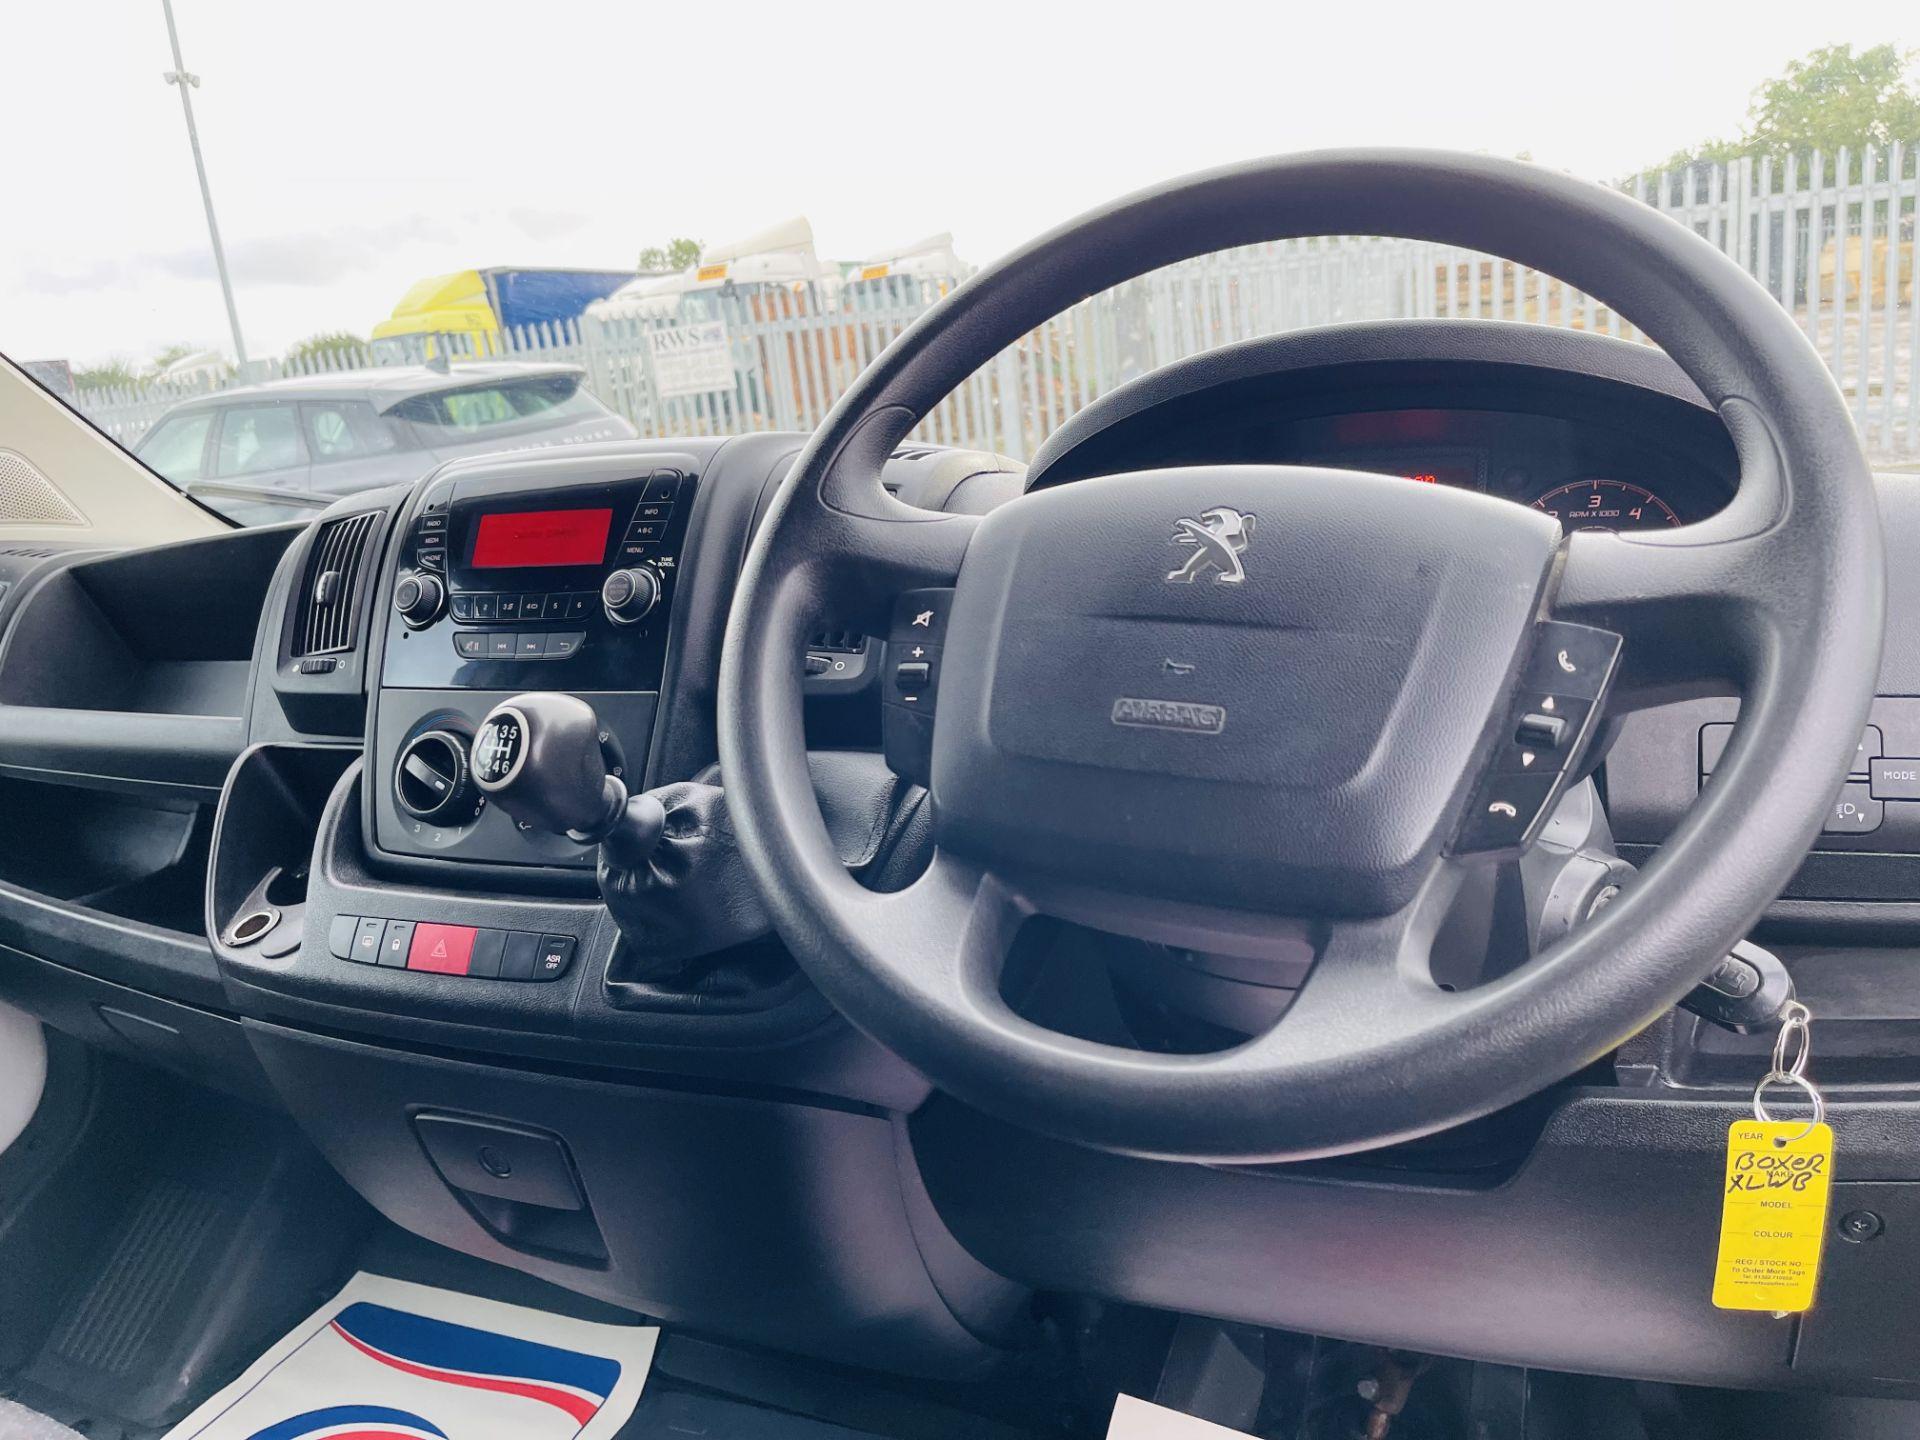 ** ON SALE ** Peugeot Boxer 2.0 BlueHDI L4 H3 2017 '66 Reg' Panel Van - LCV - Euro 6b ULEZ Compliant - Image 17 of 18